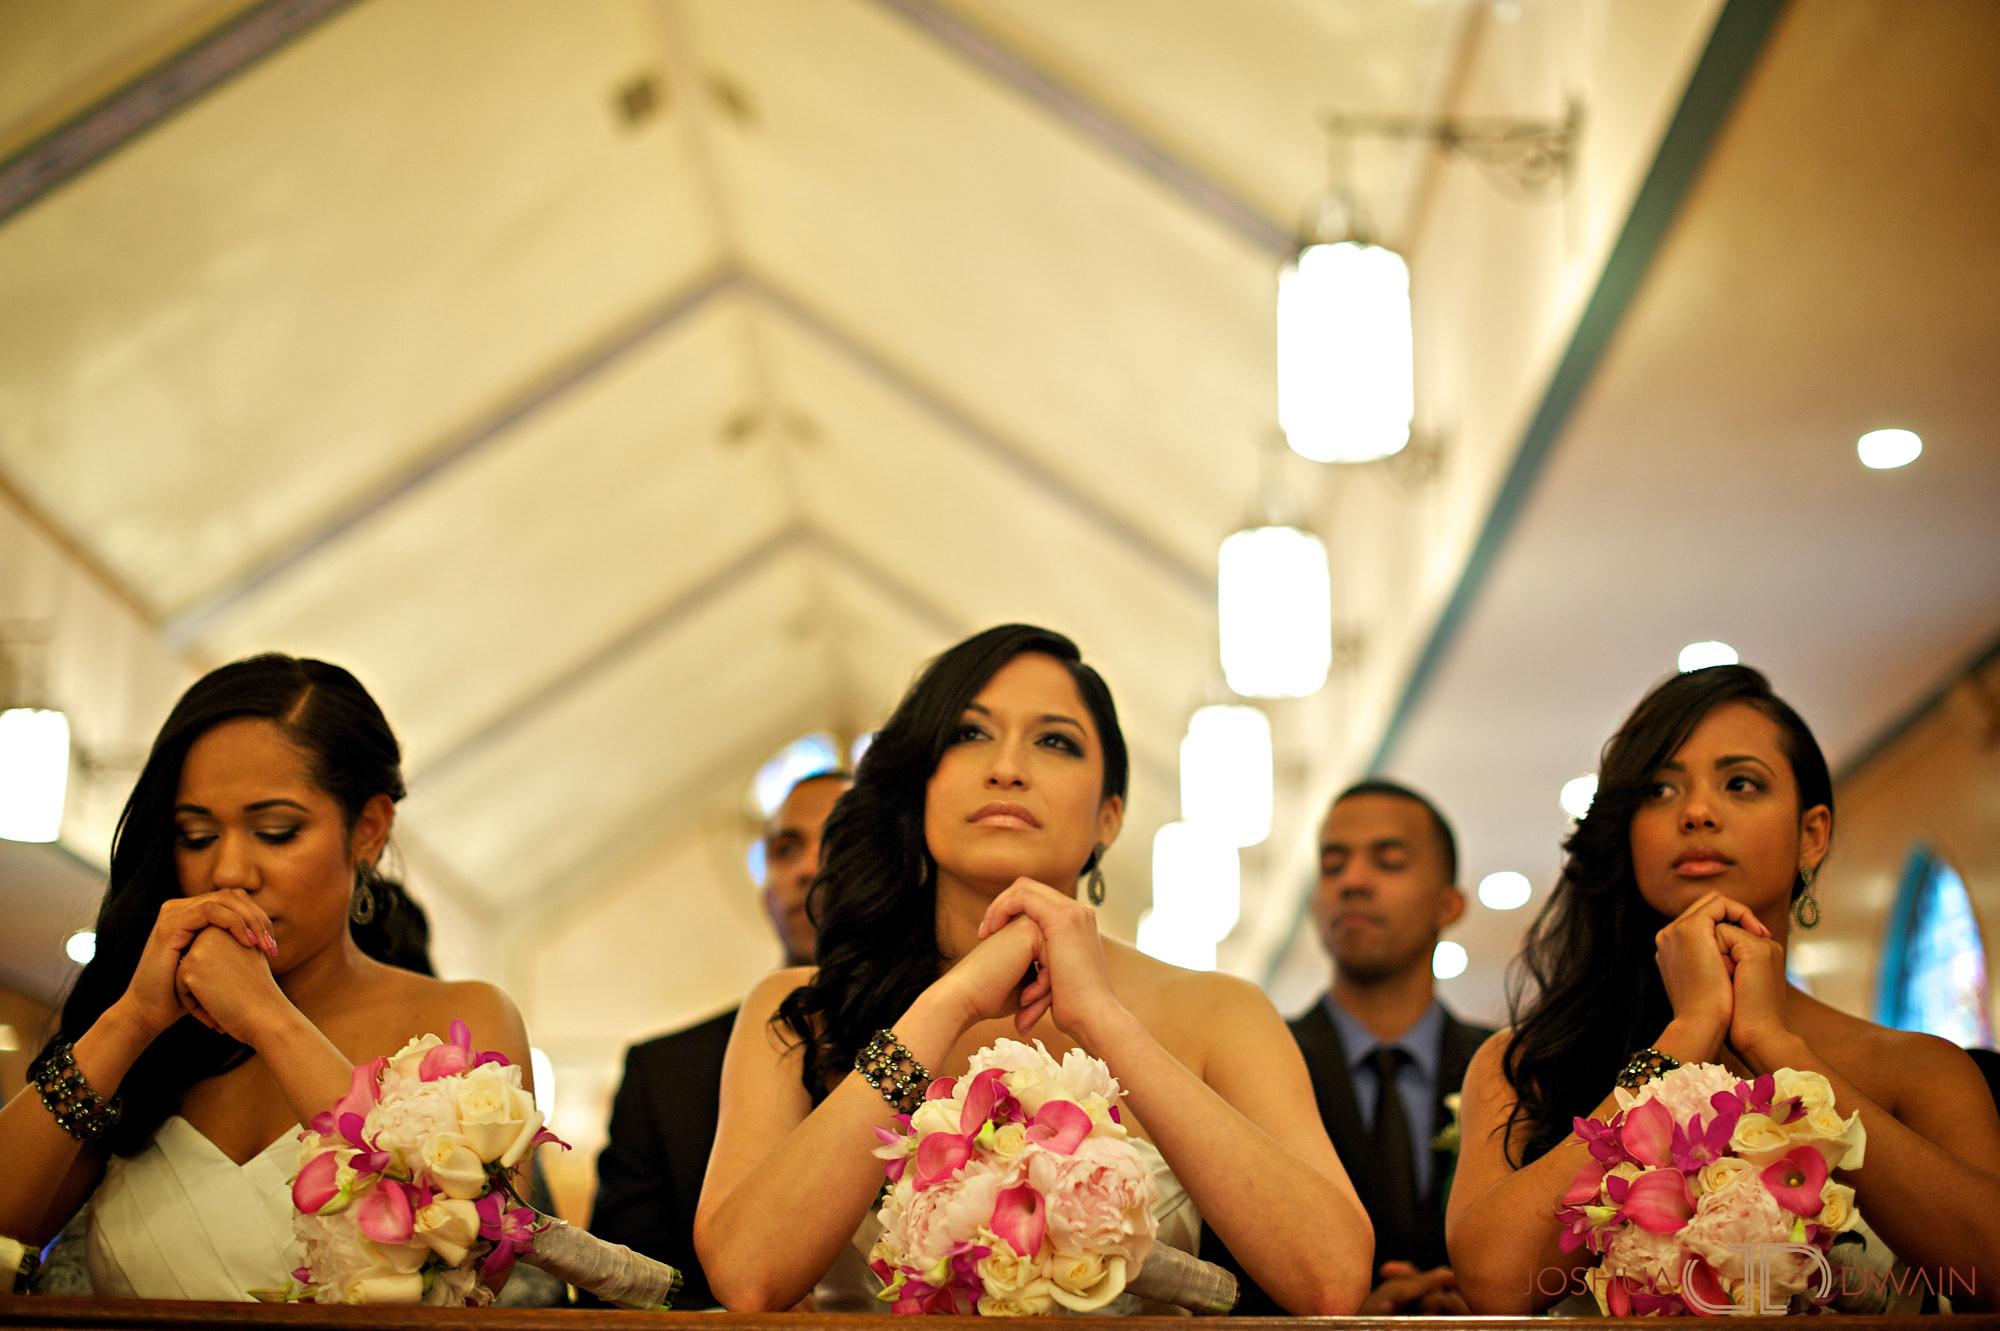 carolina-hector-021-chateau-briandlong-island-new-york-wedding-photographer-joshua-dwain-2011-05-13_ch_0613